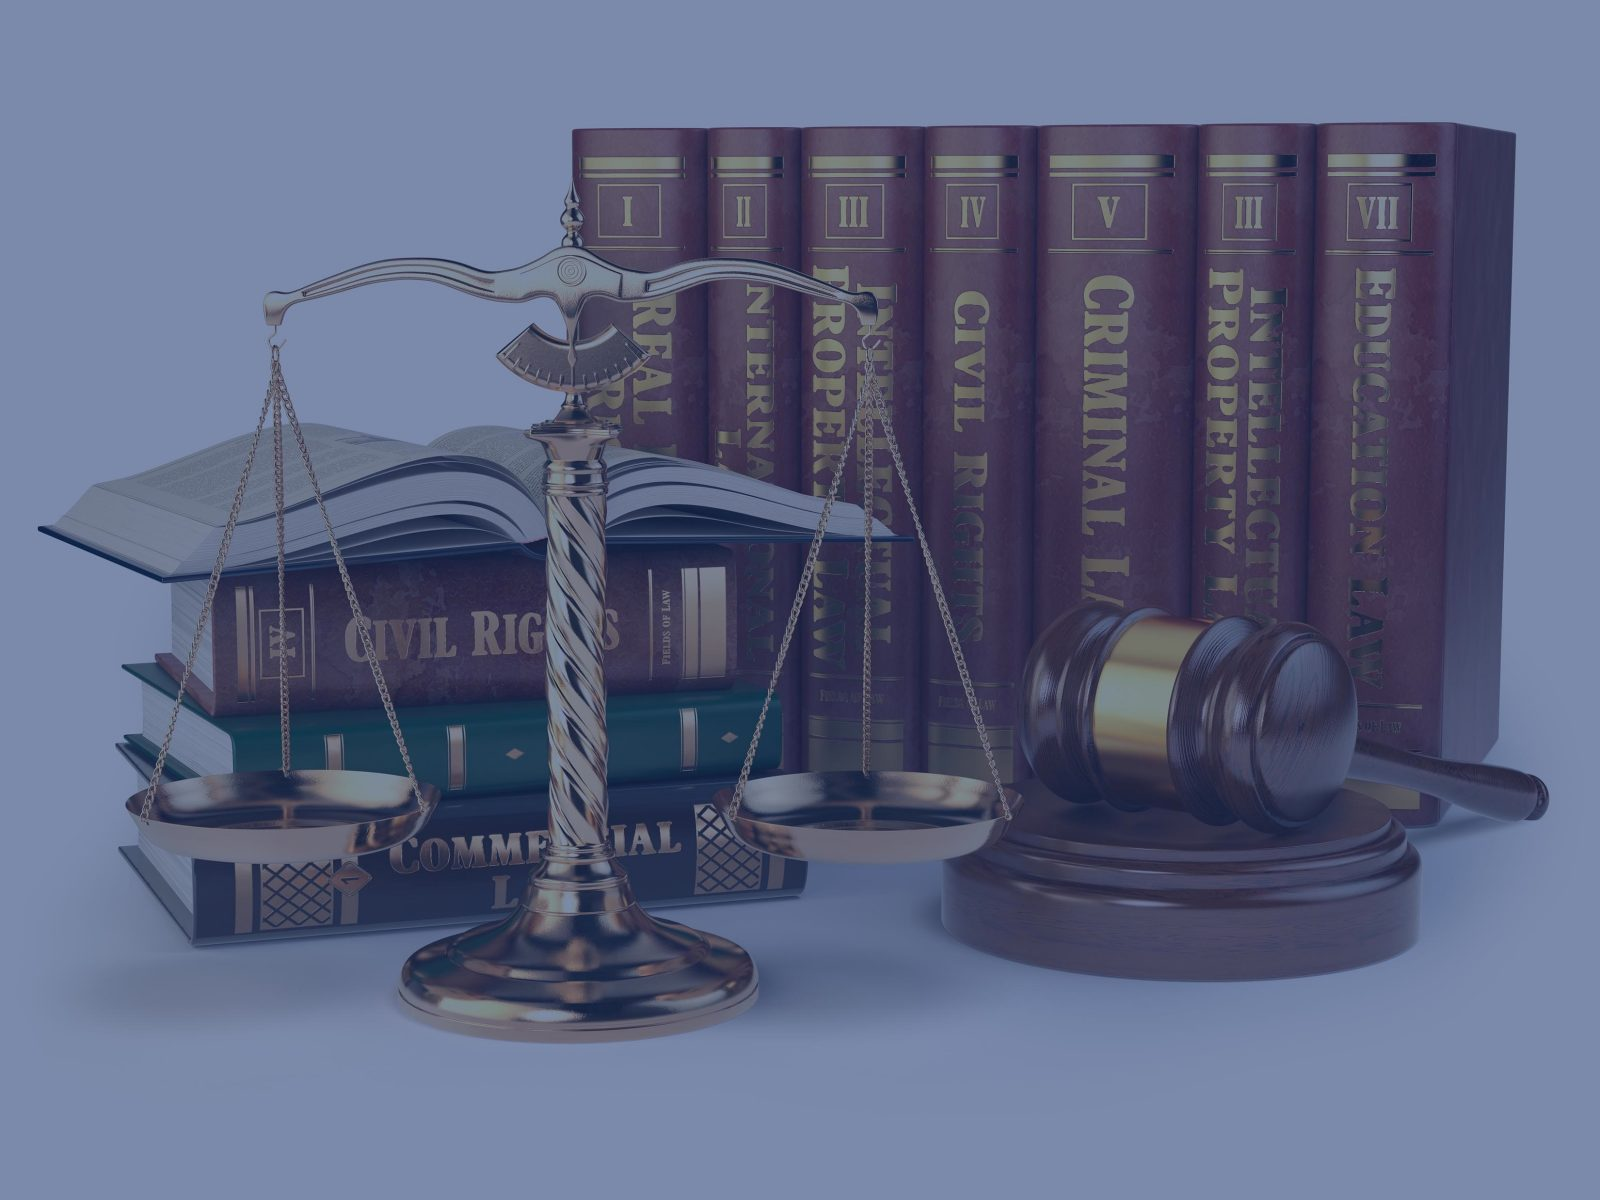 Books and legal paraphernalia